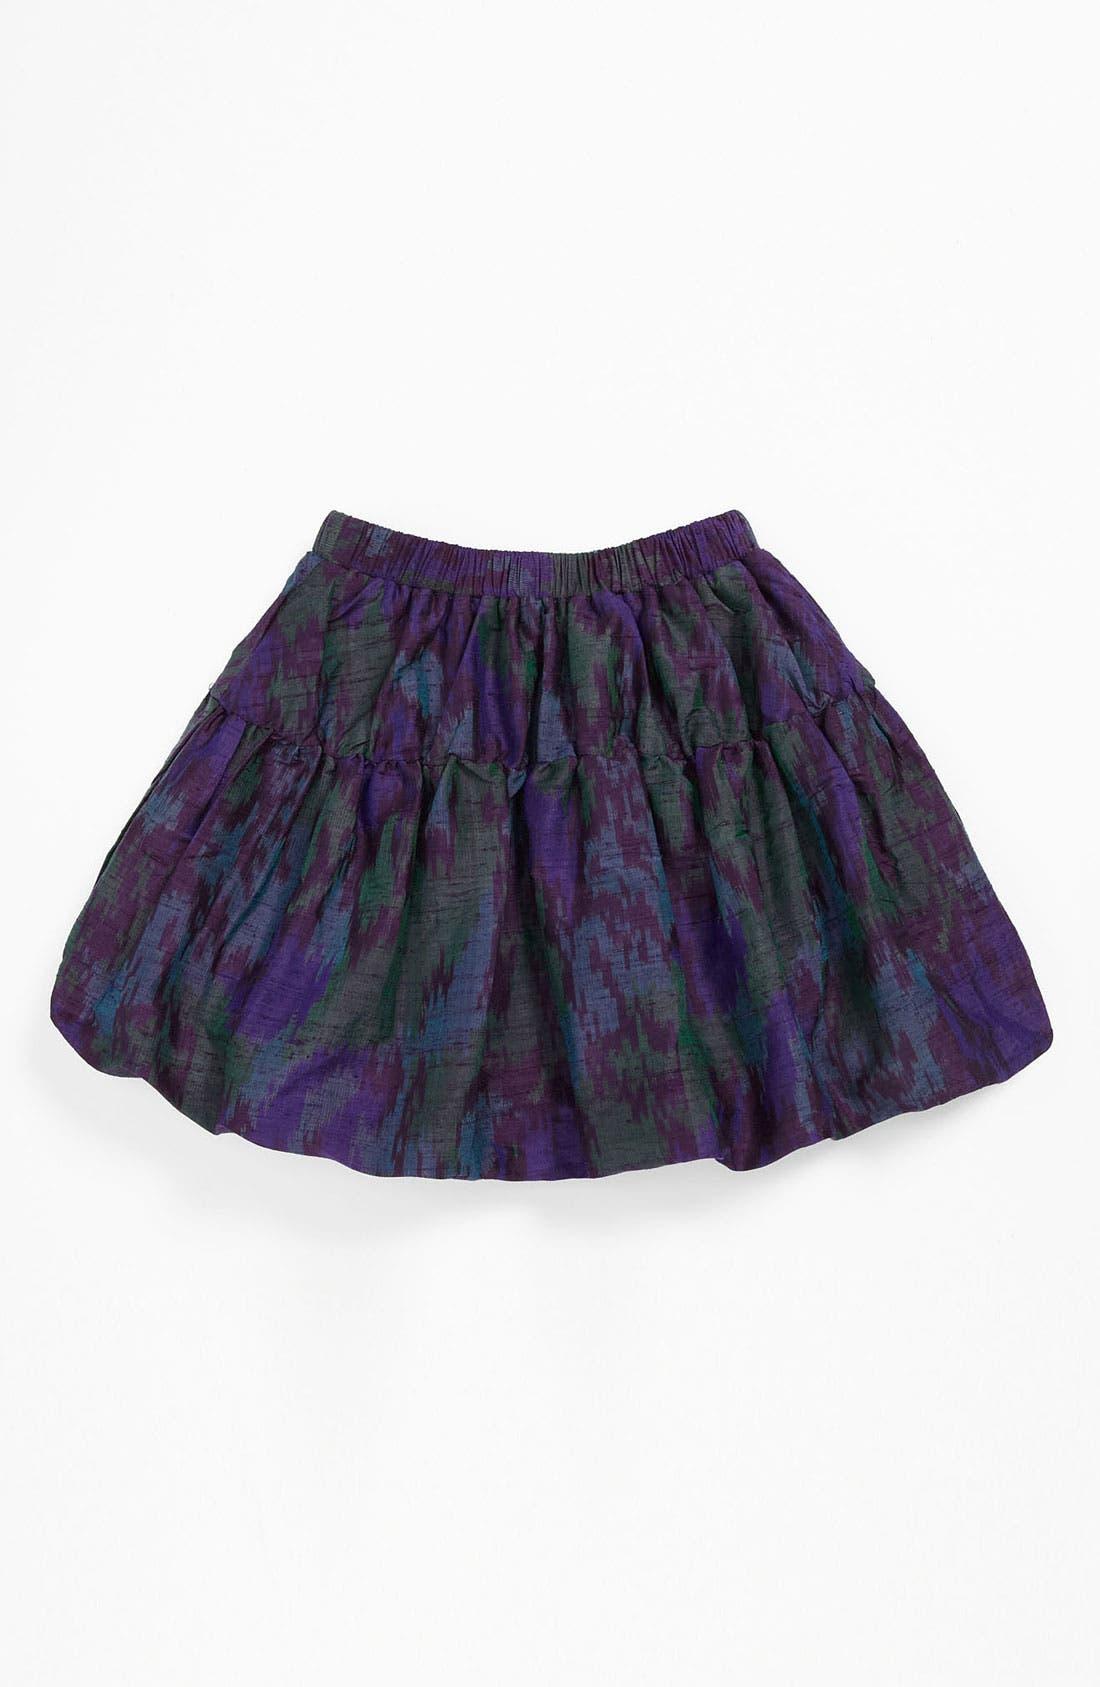 Main Image - Peek 'Olivia' Skirt (Toddler, Little Girls & Big Girls)